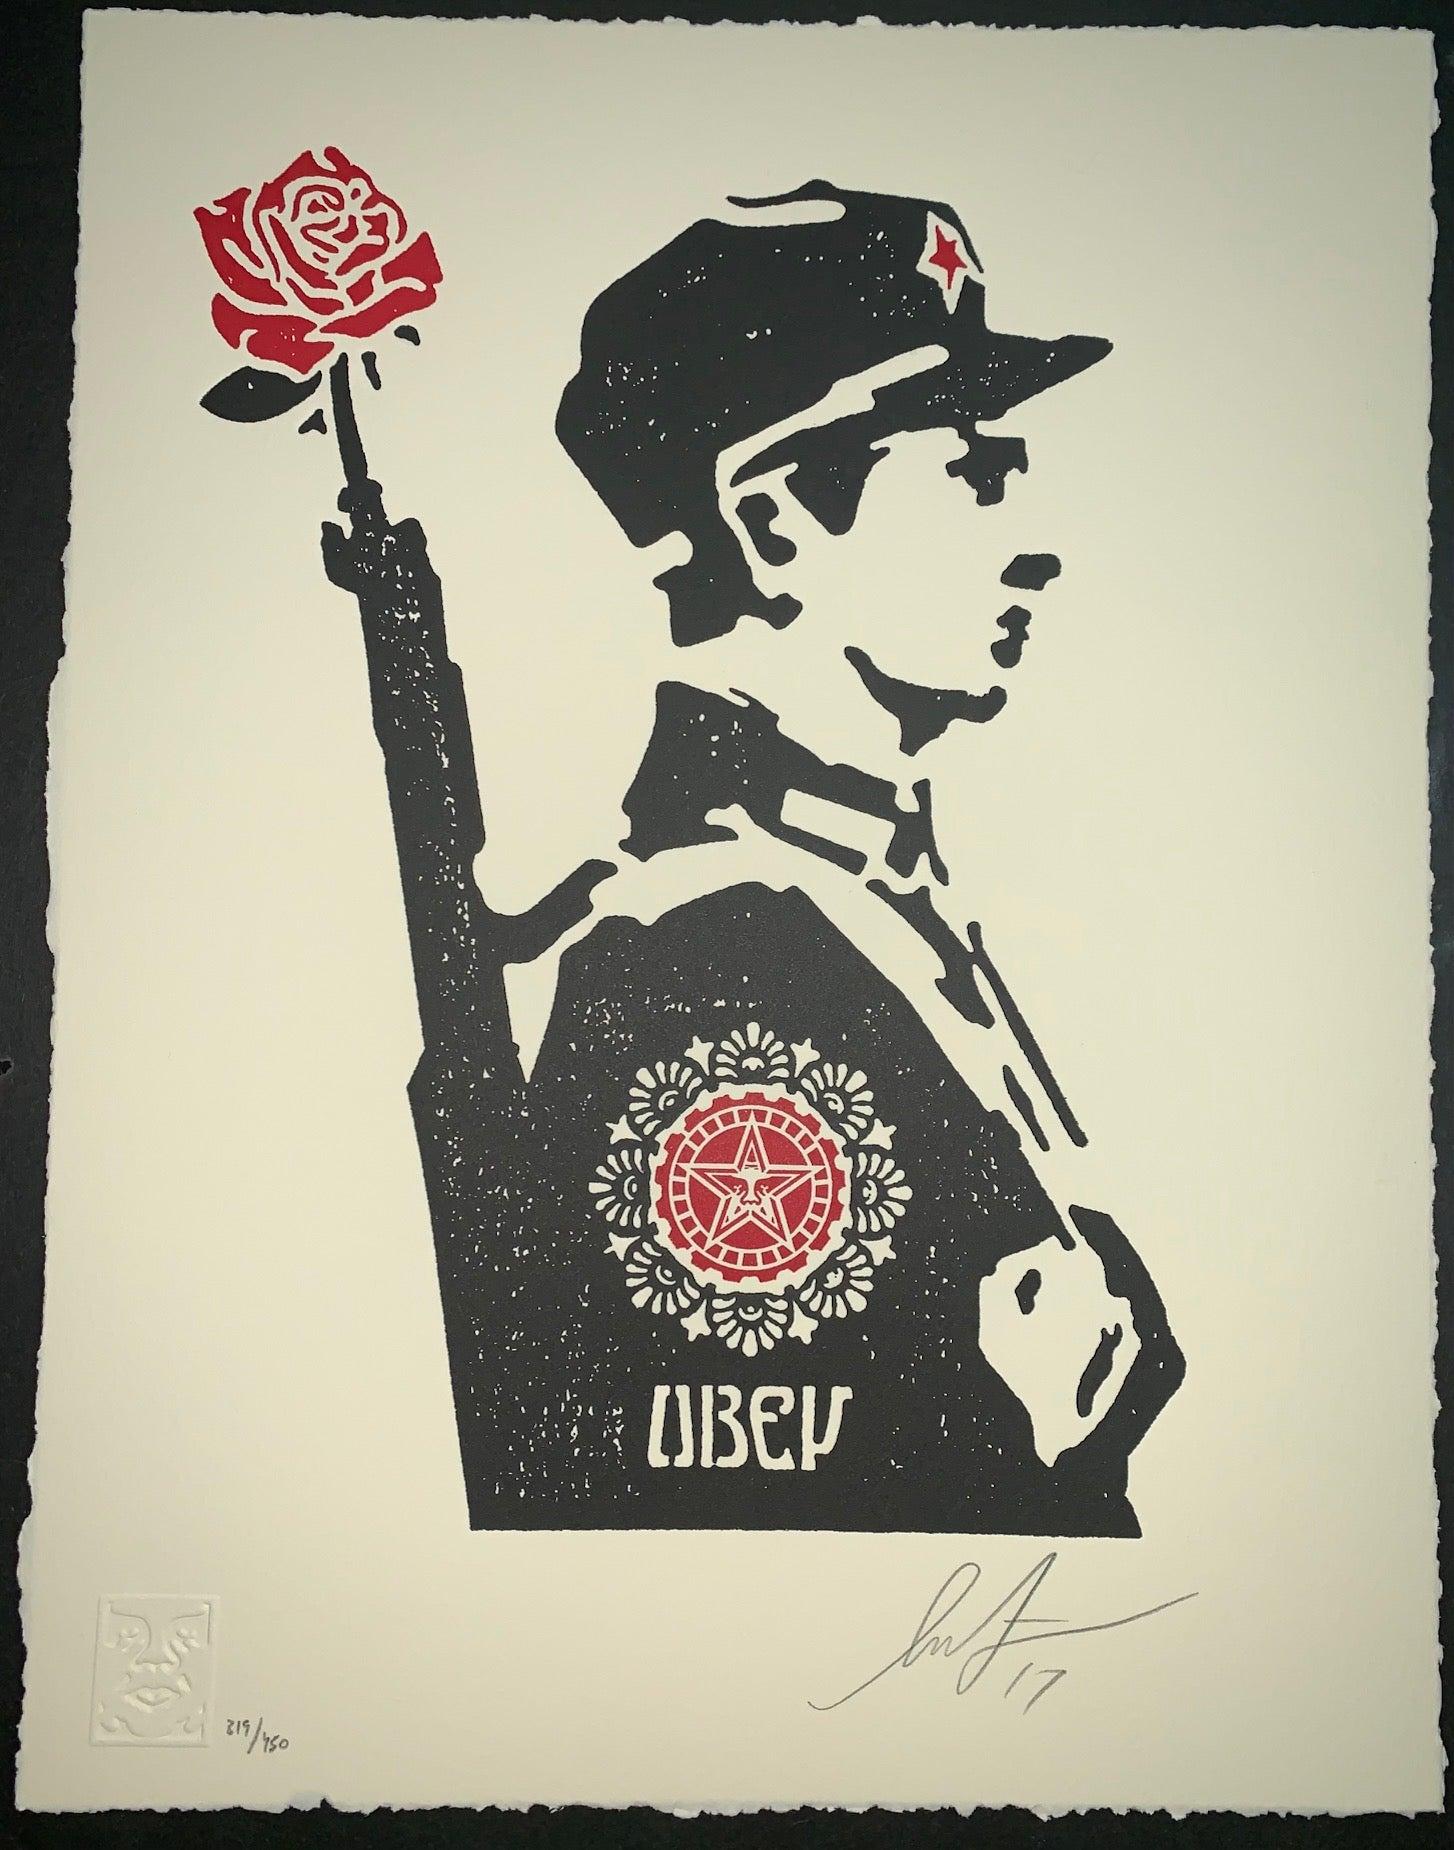 Shepard Fairey Rose Soldier Letterpress Edition 2017 Obey Giant Mint